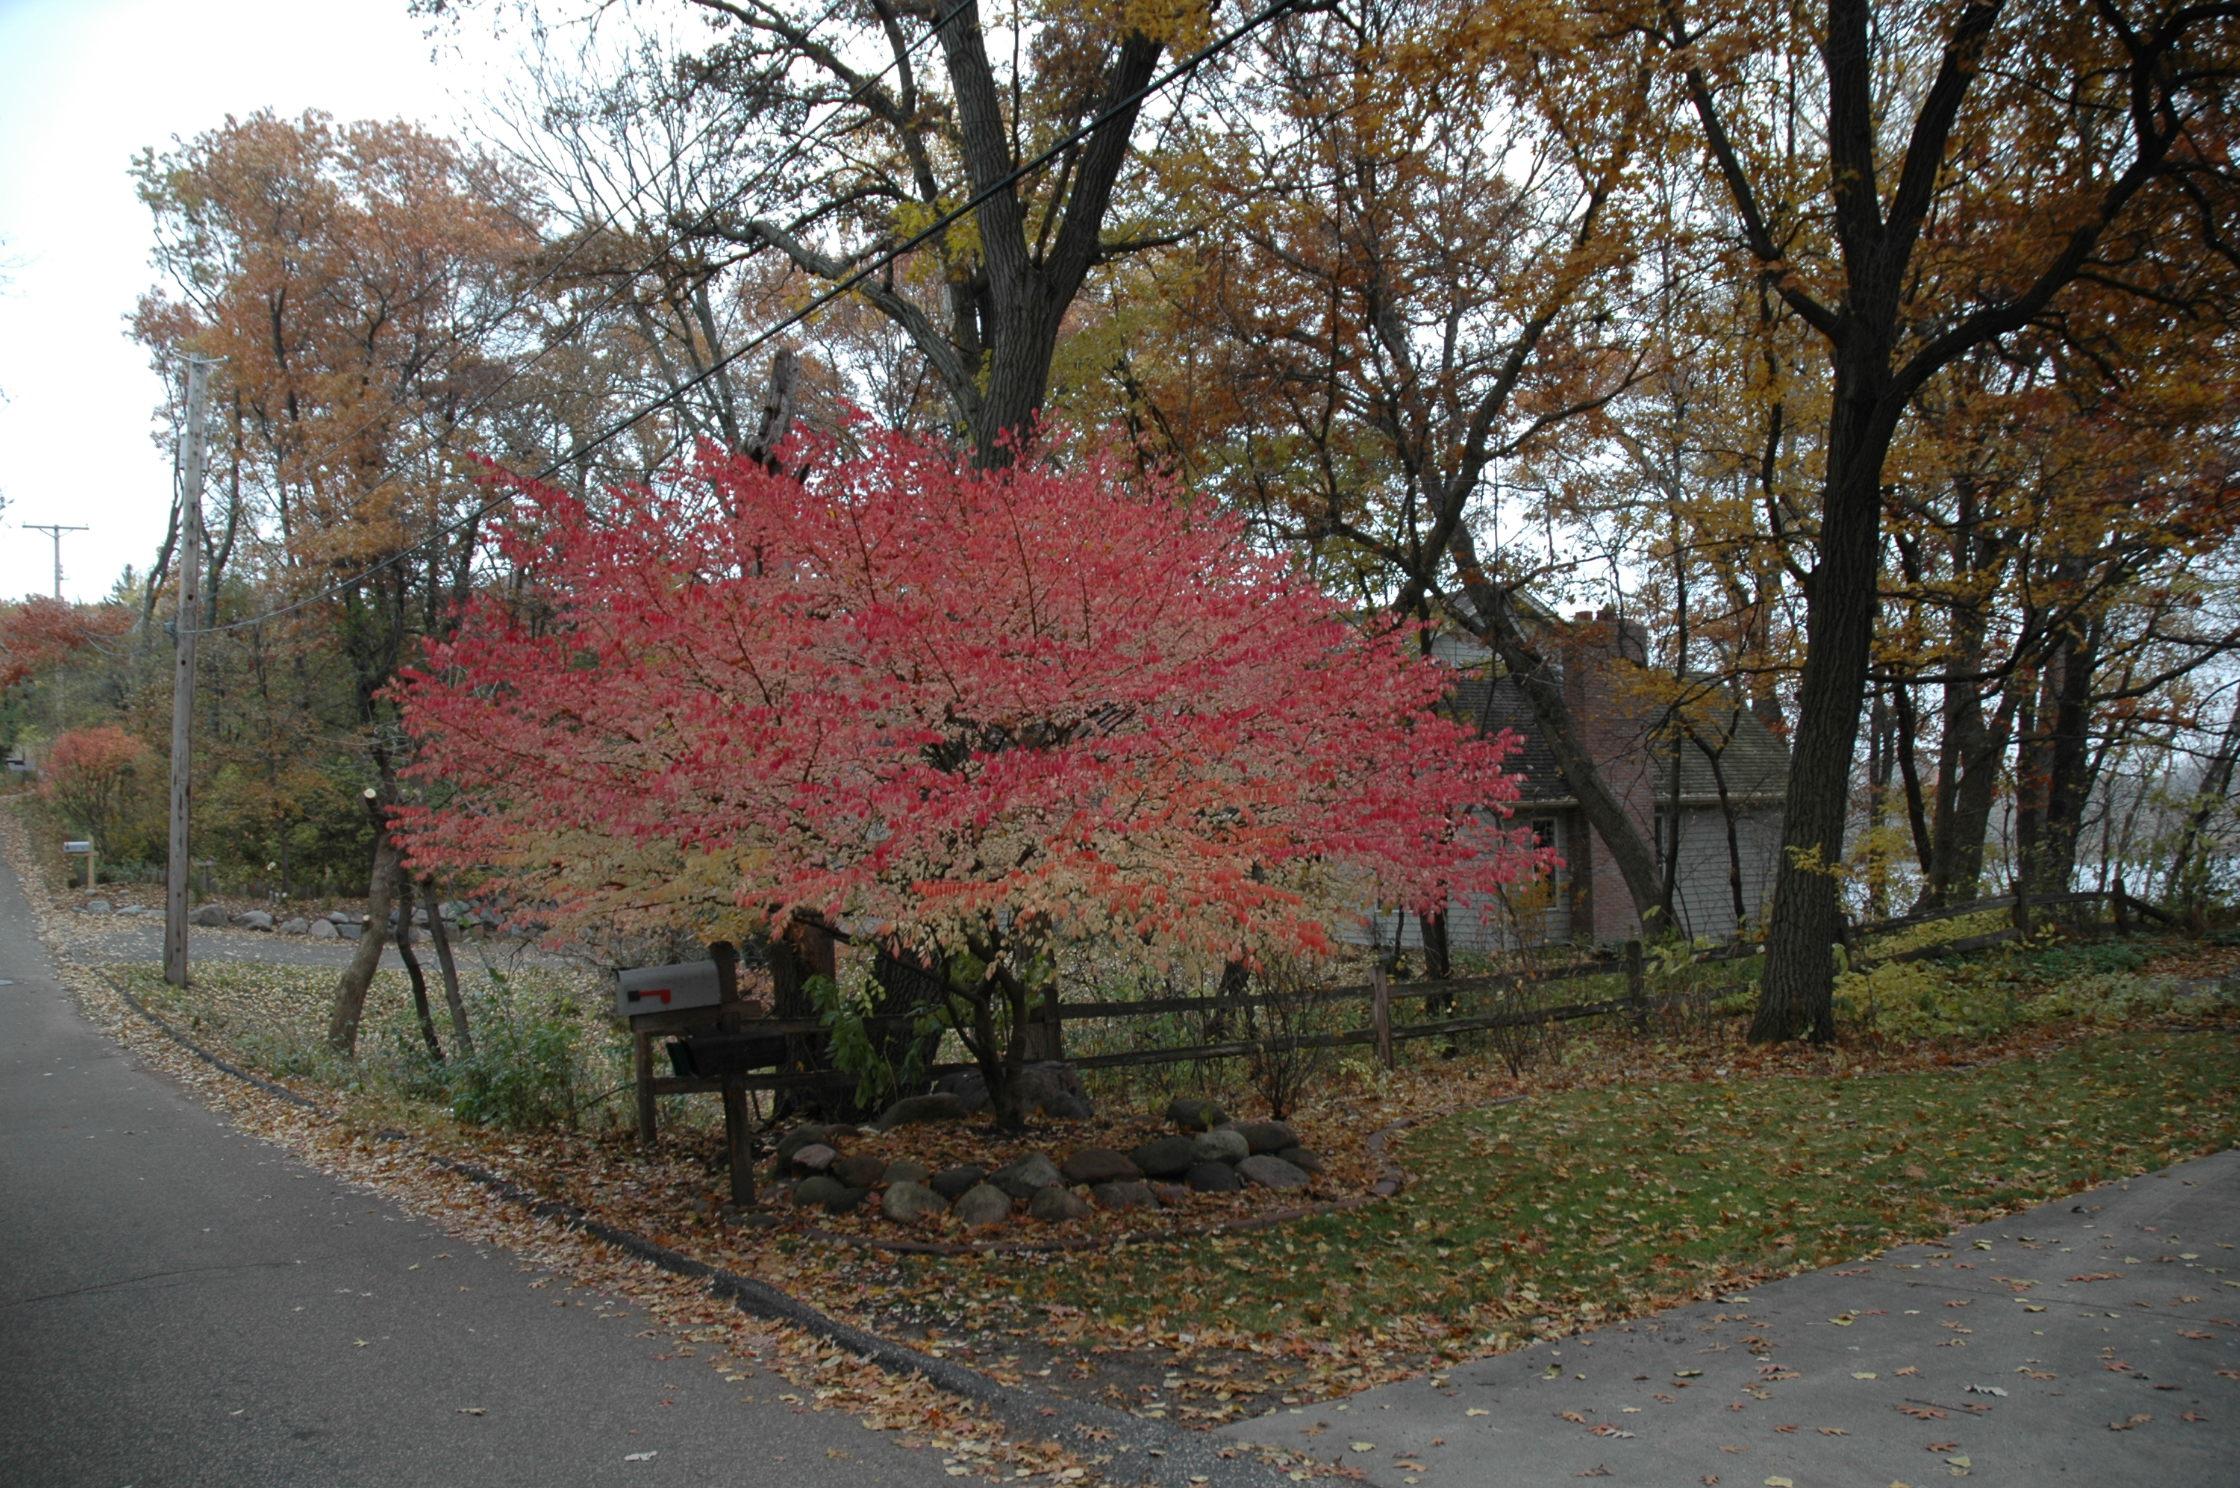 Burning Bush (Euonymus alatus) : UMN Extension